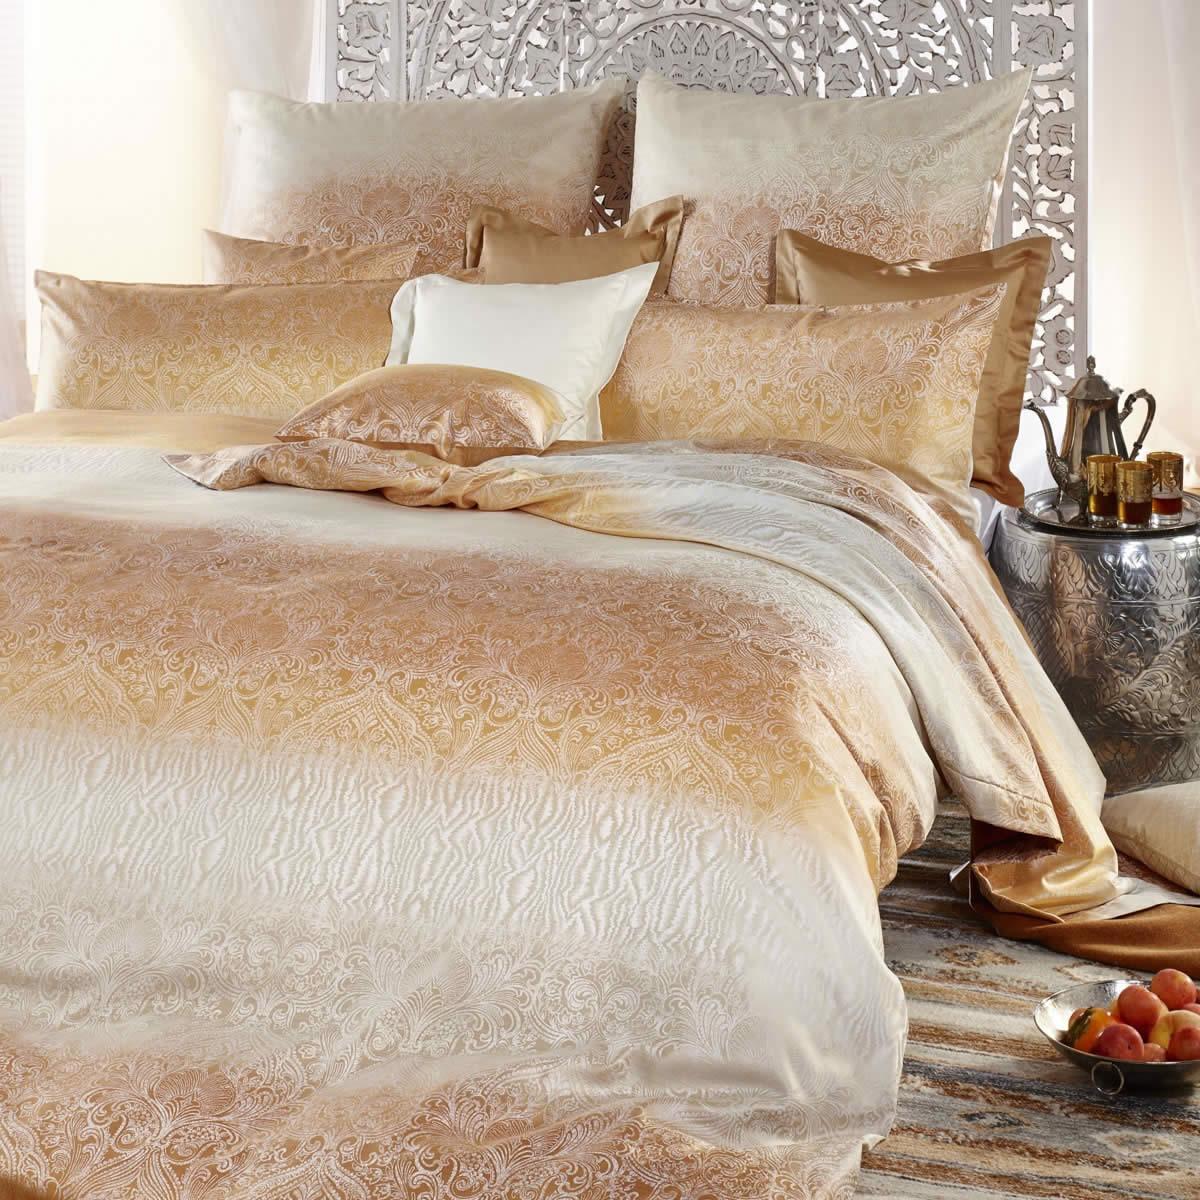 curt bauer mako brokat damast bettw sche soraya 2515 0133 safran. Black Bedroom Furniture Sets. Home Design Ideas